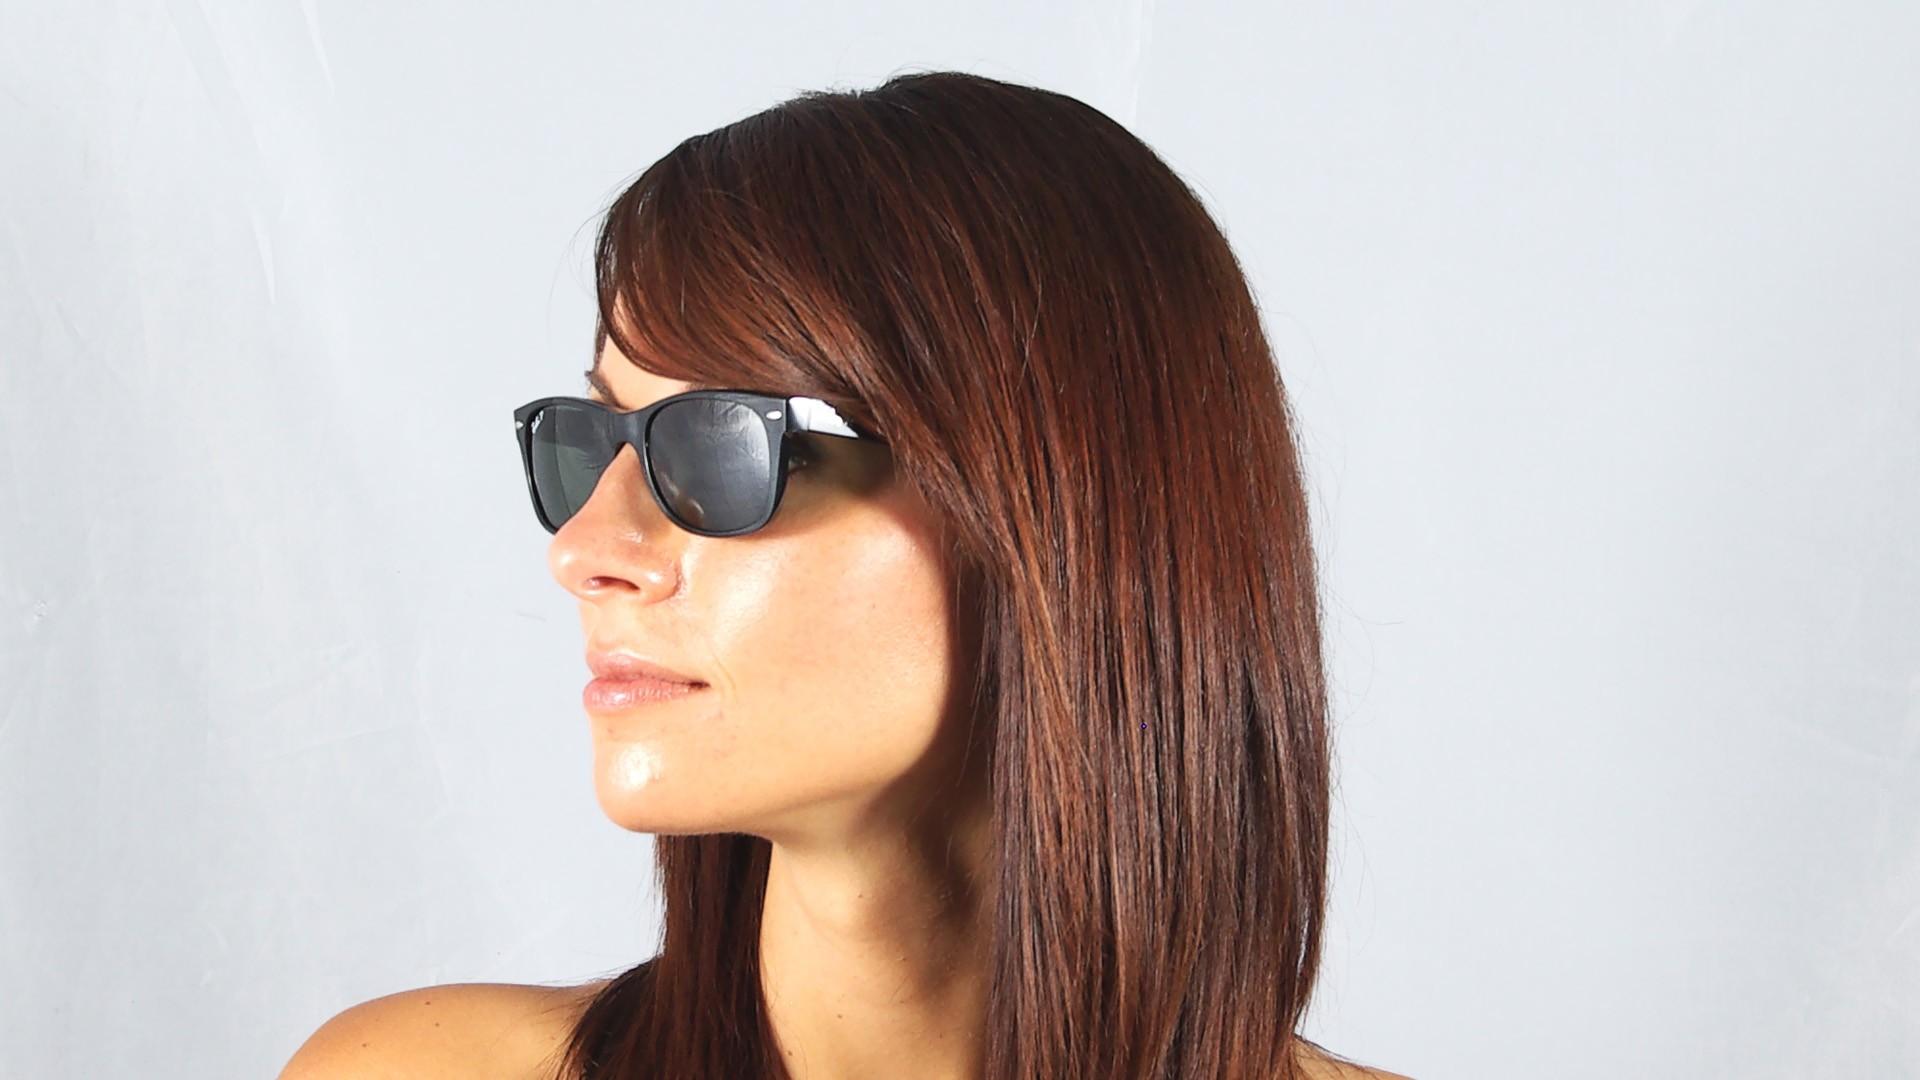 4fc035854d Sunglasses Ray-Ban New Wayfarer Black G15 RB2132 901 58 52-18 Medium  Polarized